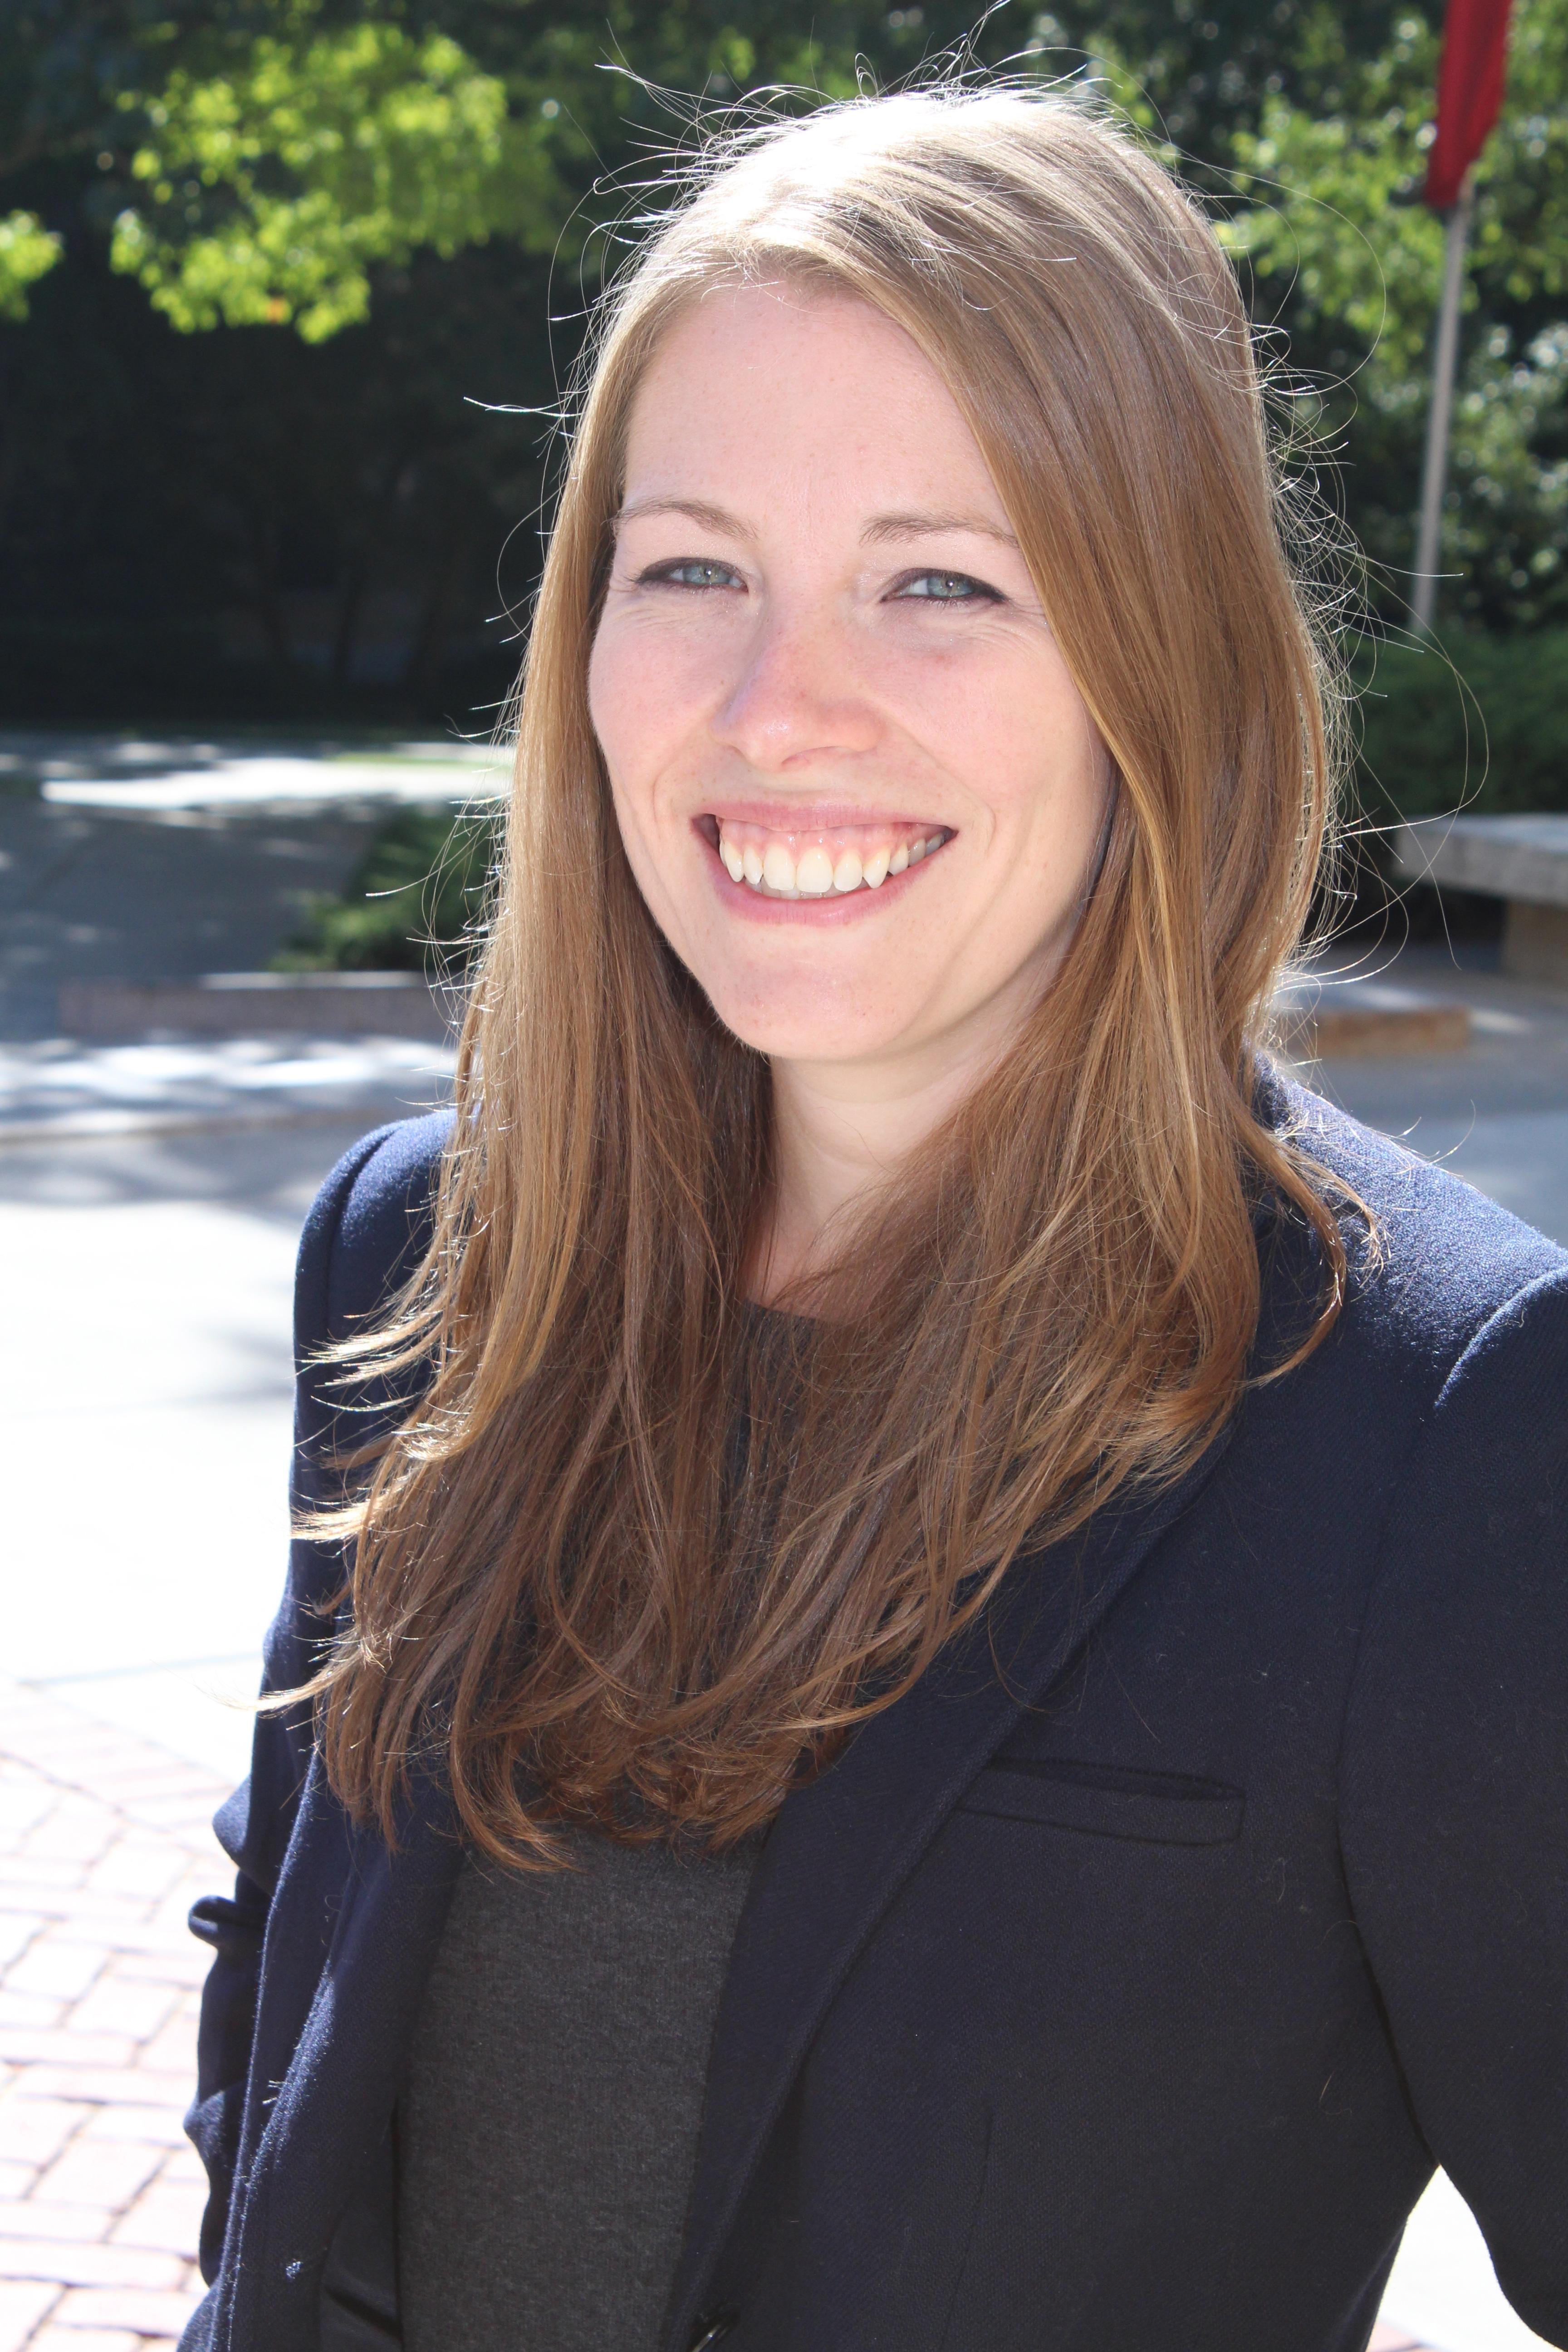 Meredith Metzler   School of Journalism and Mass Communication